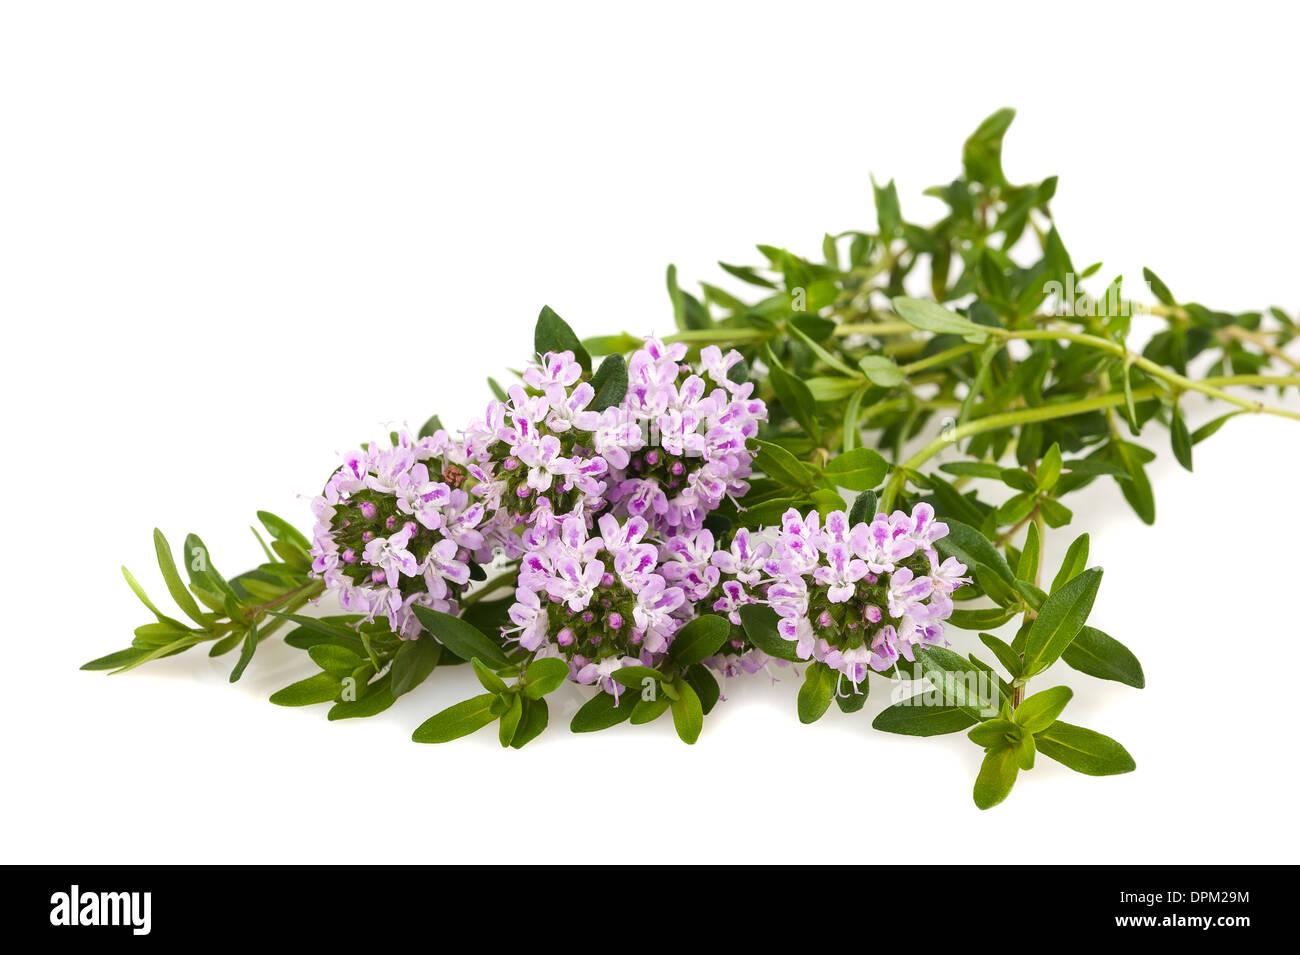 Savory fresh herb isolated on white background - Stock Image